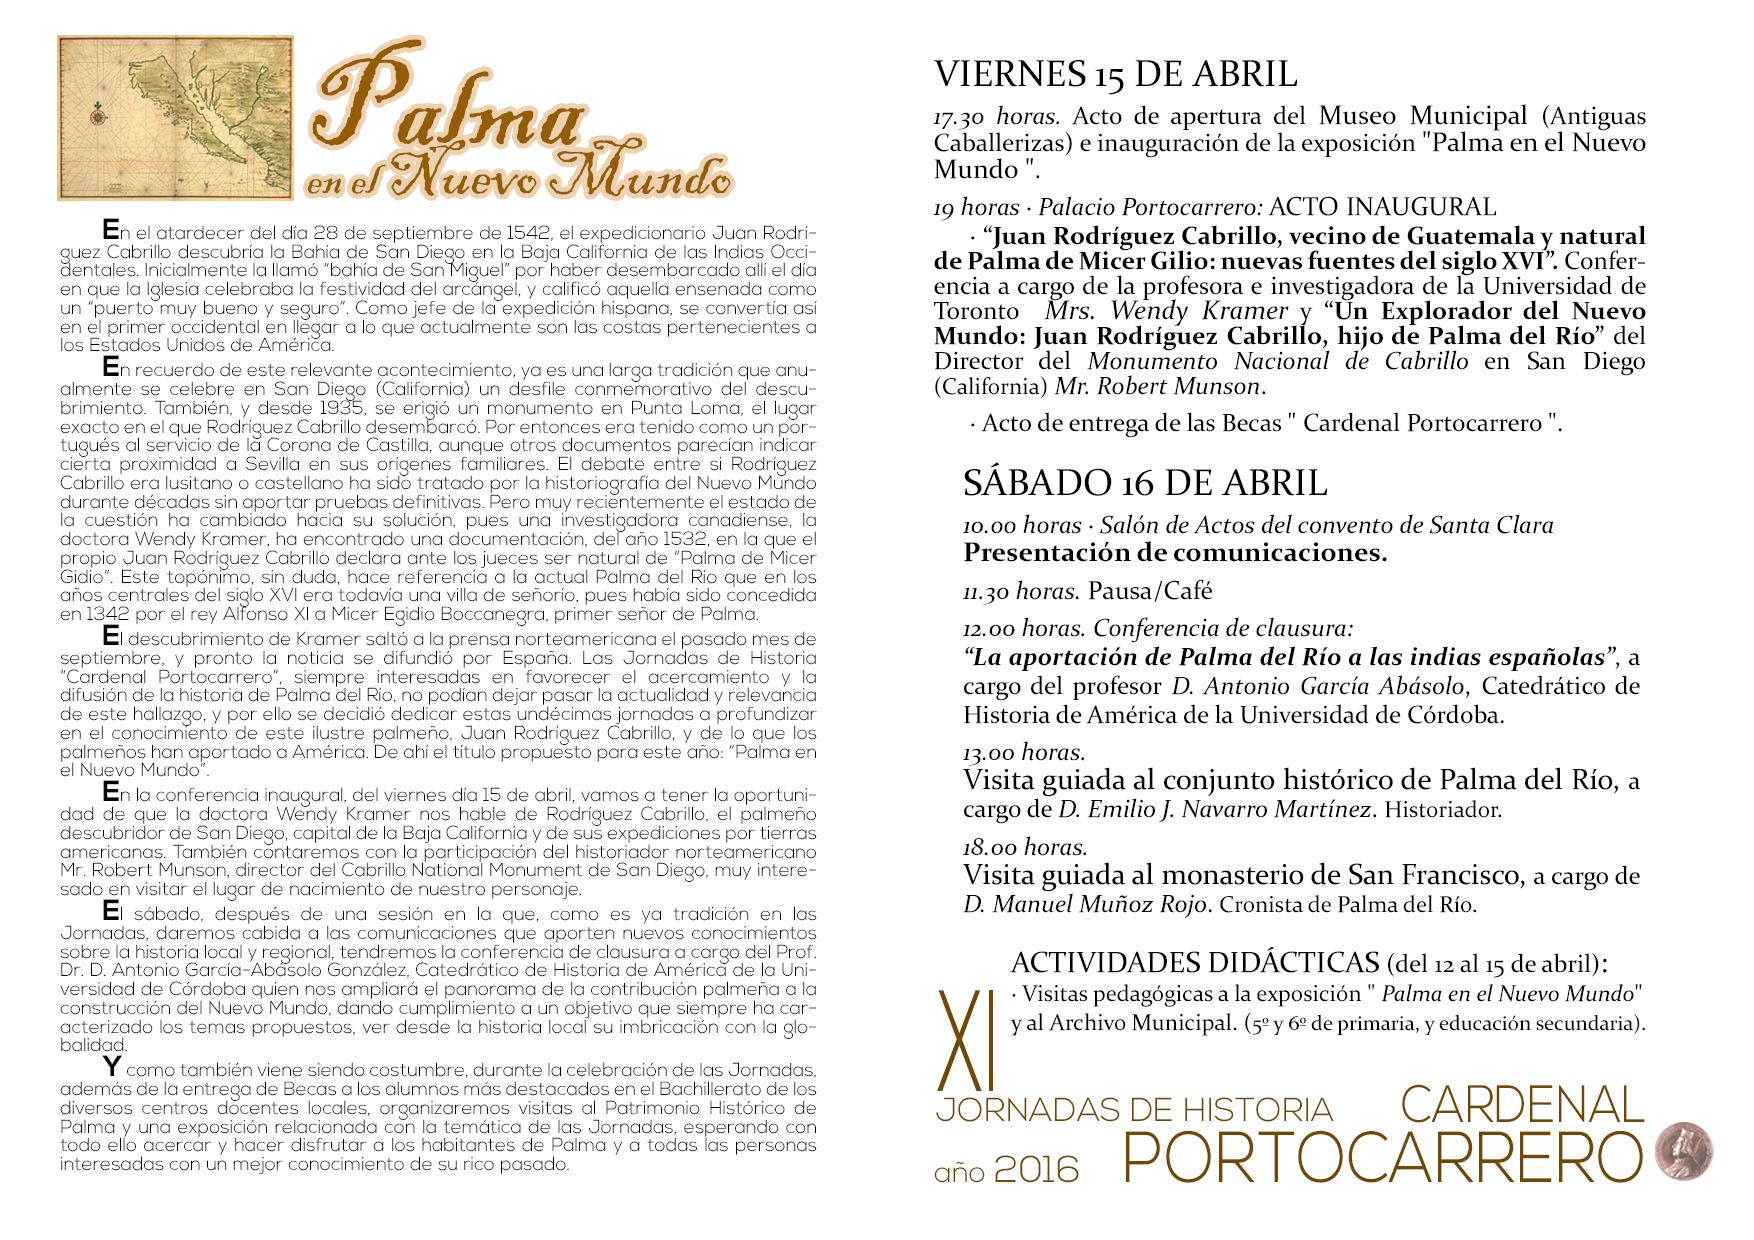 https://www.palmadelrio.es/sites/default/files/diptico_portocarrero_actividades_2016.jpg